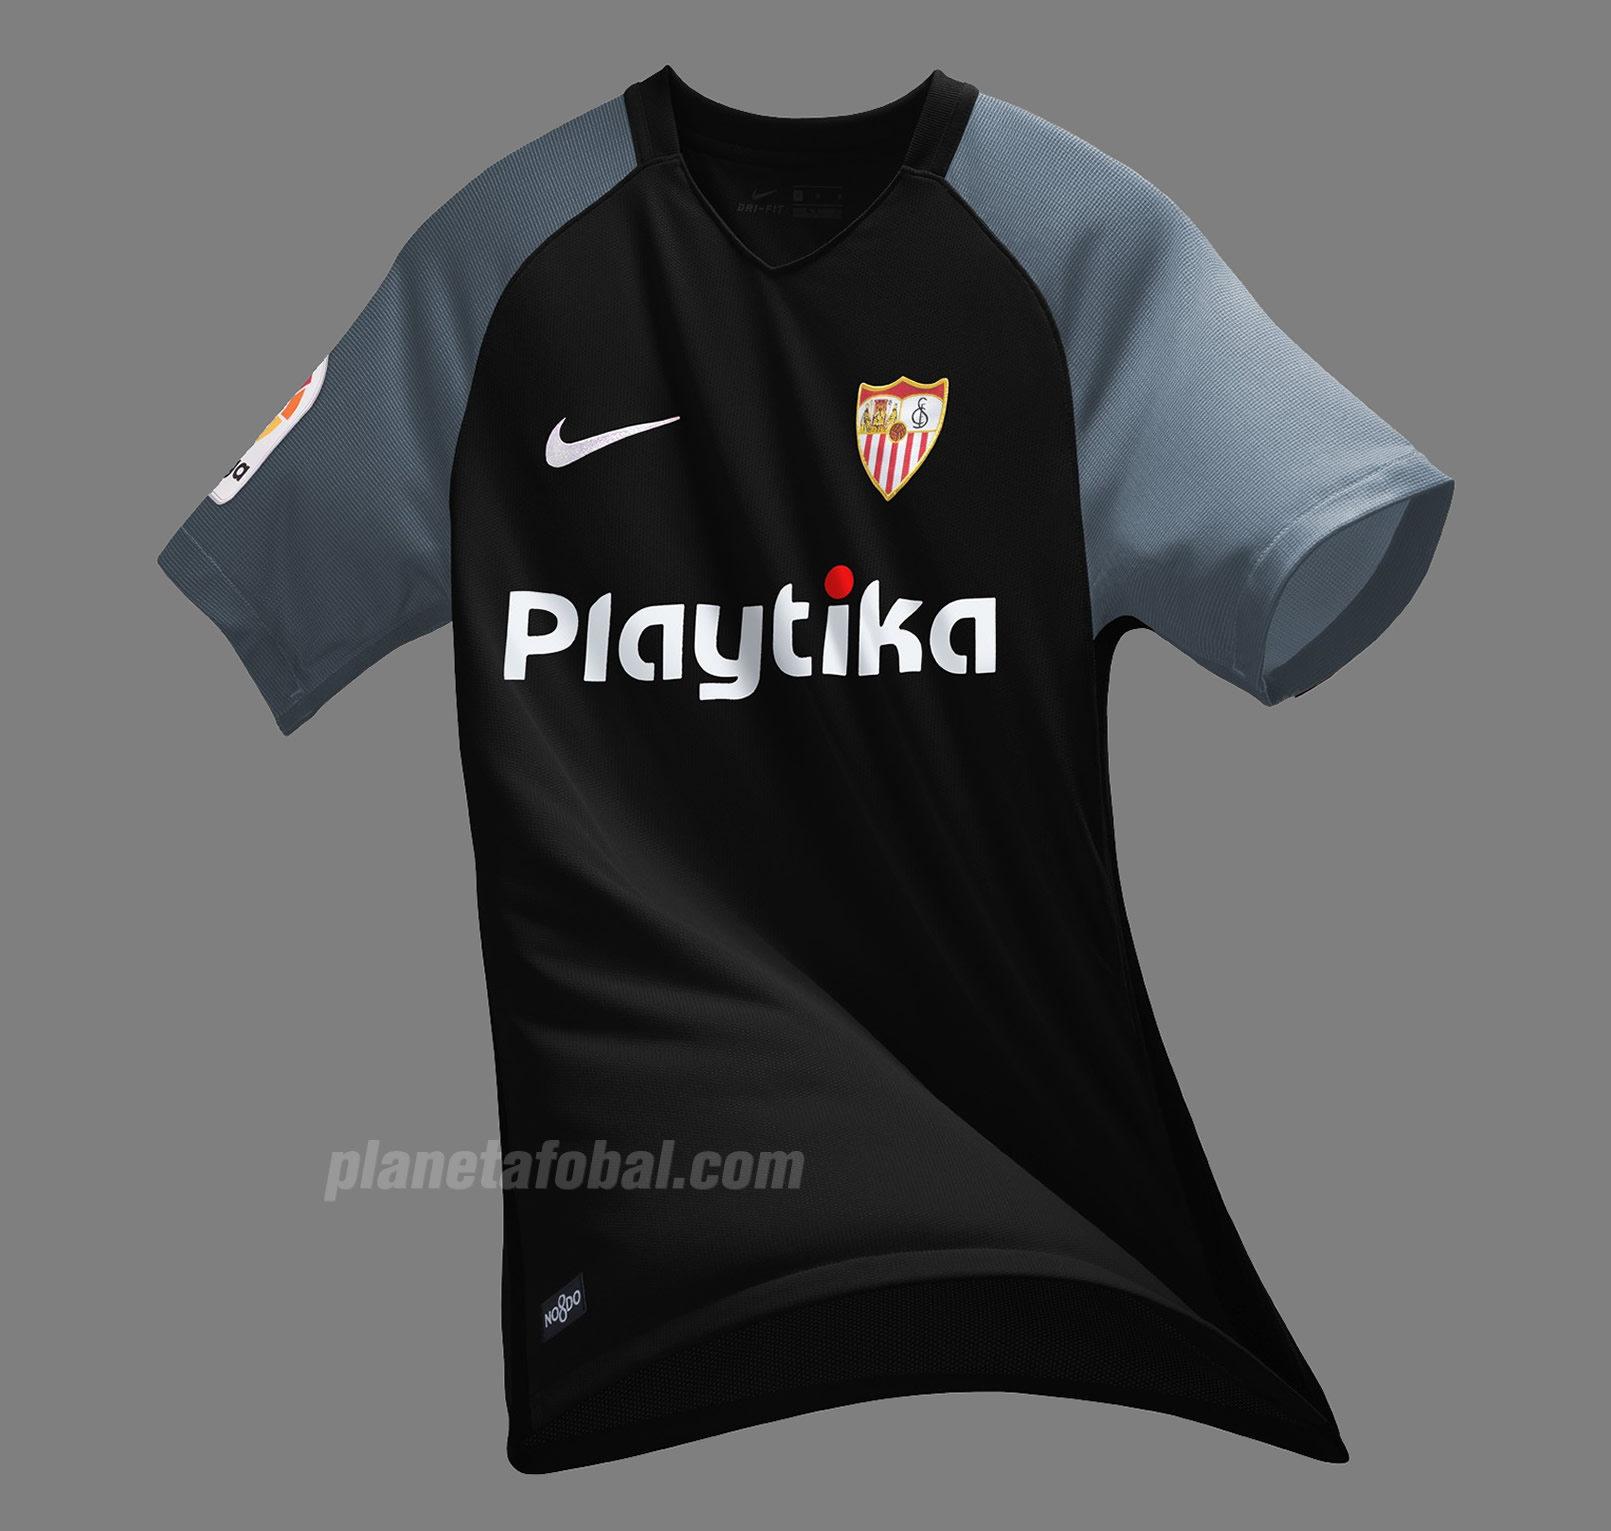 Terceca camiseta 2018/19 del Sevilla | Imagen Nike